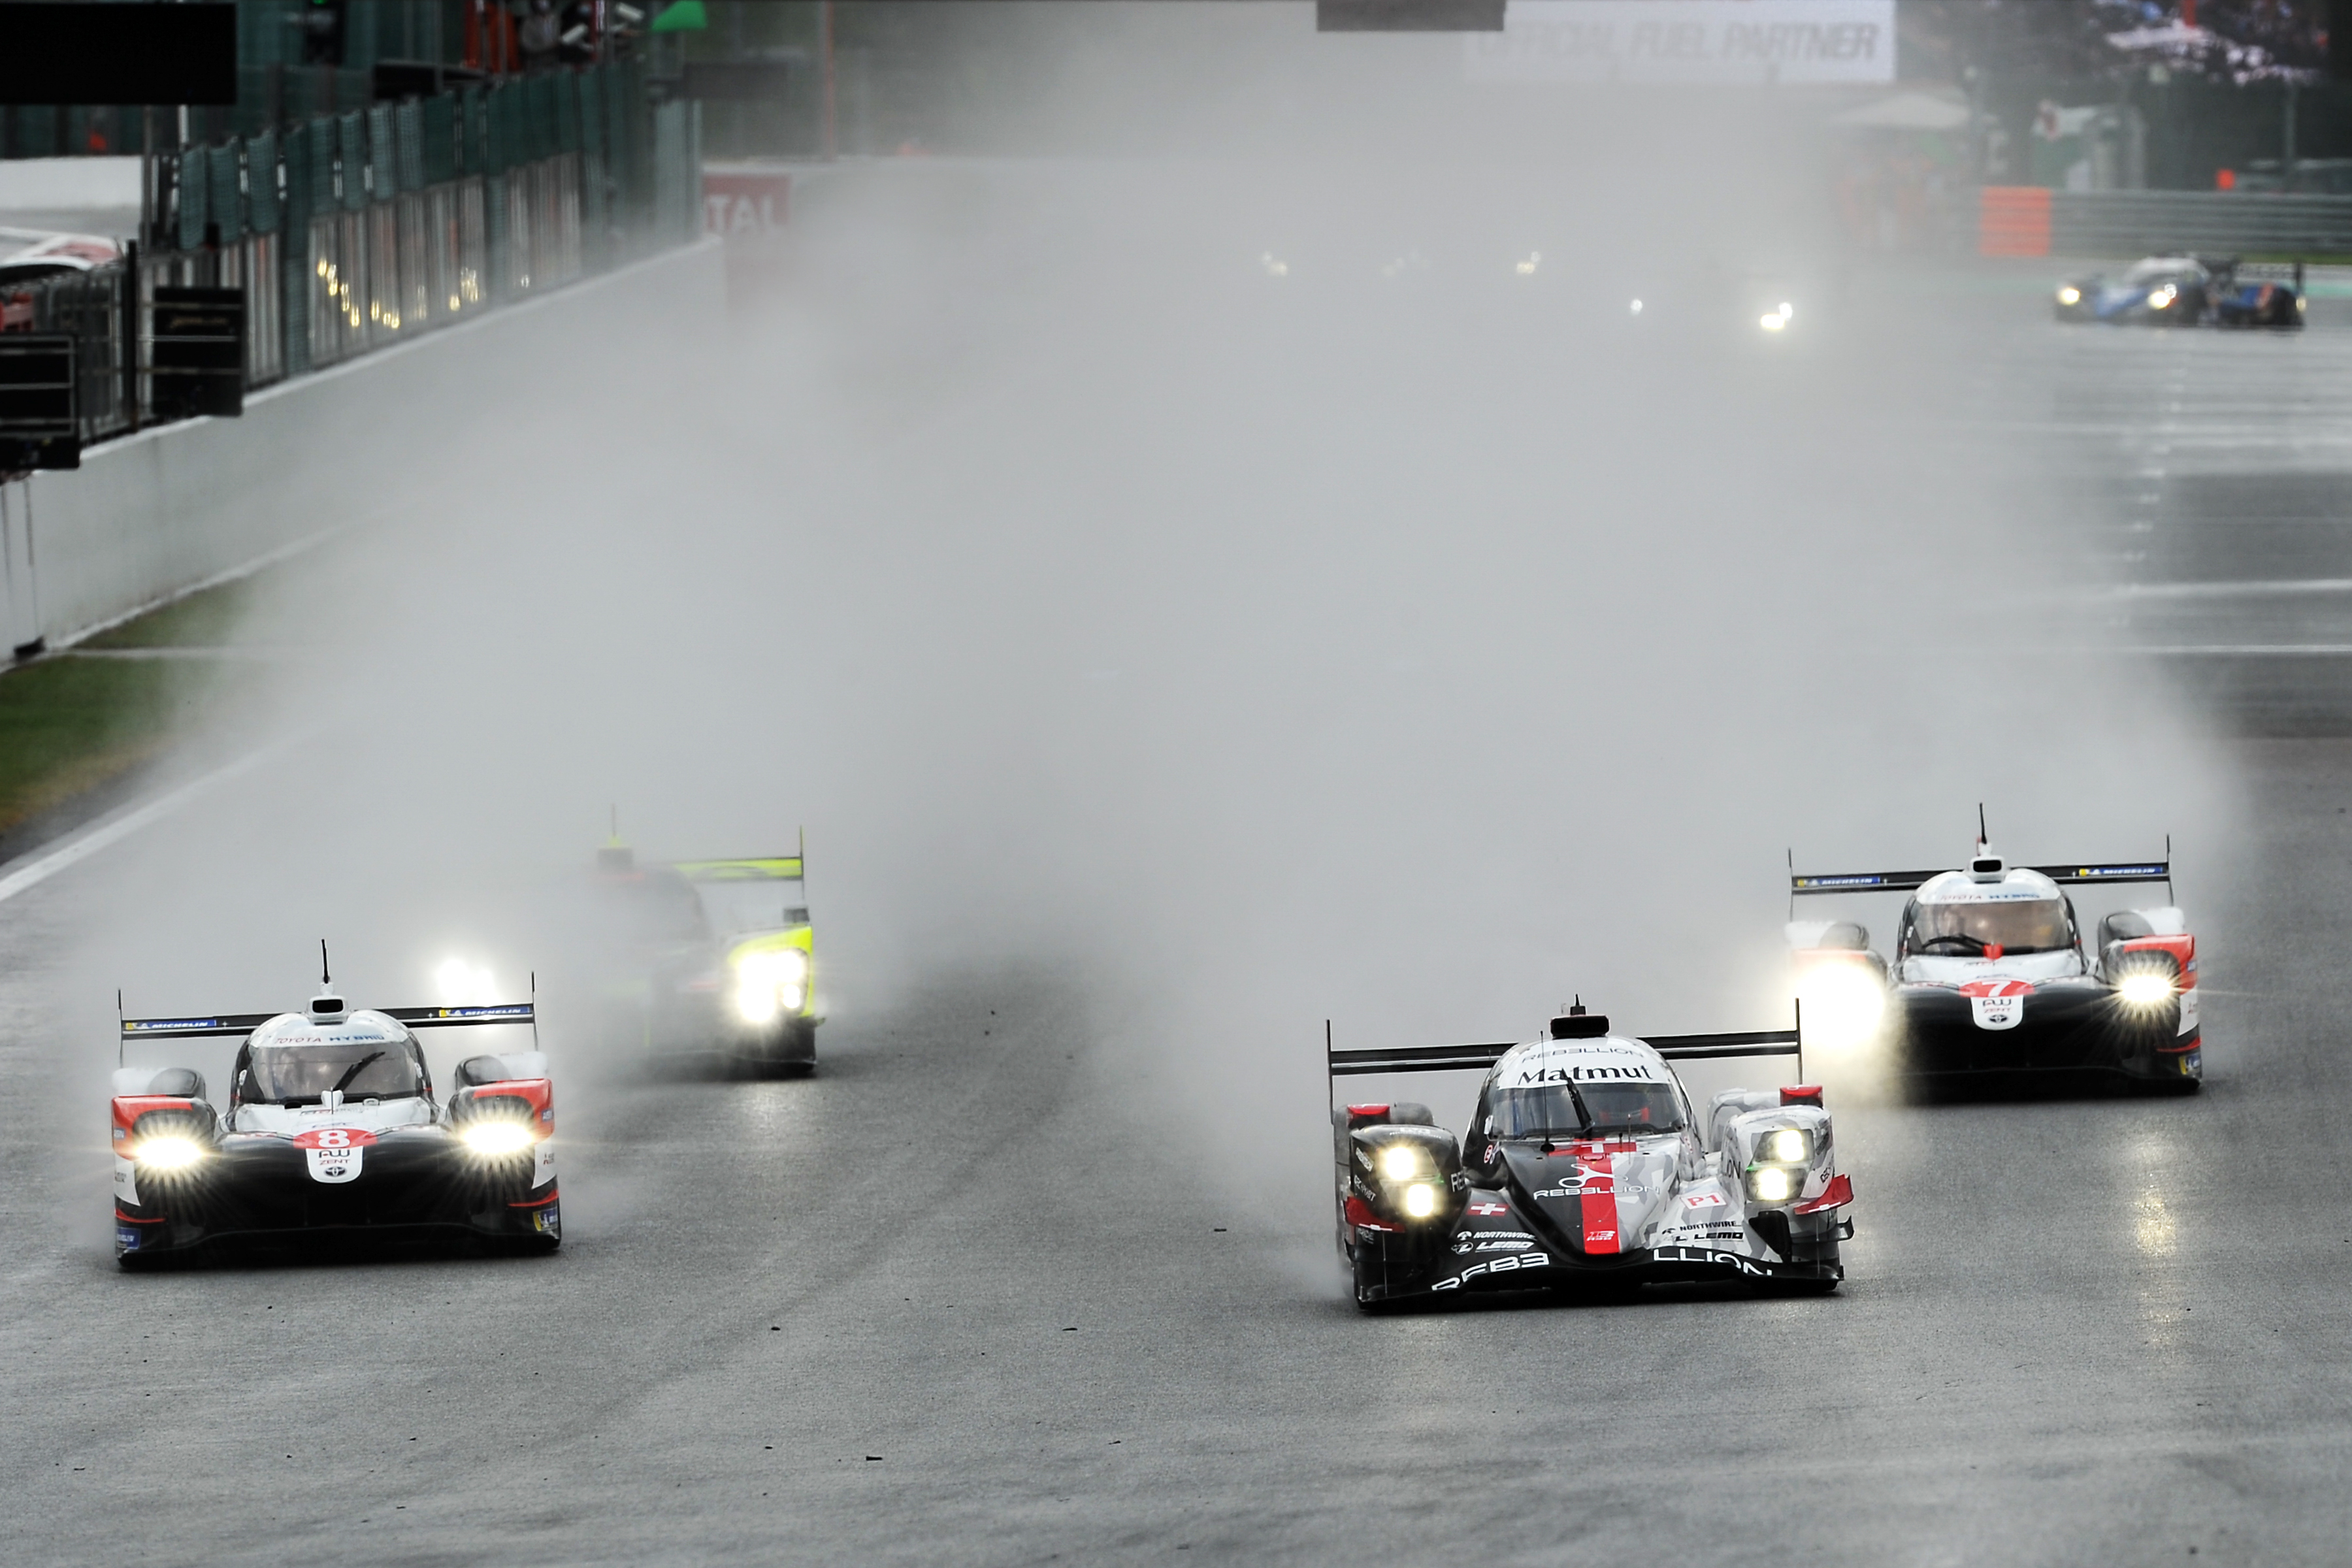 Motor Racing Fia World Endurance Championship Wec Round 1 Spa Francorchamps, Belgium